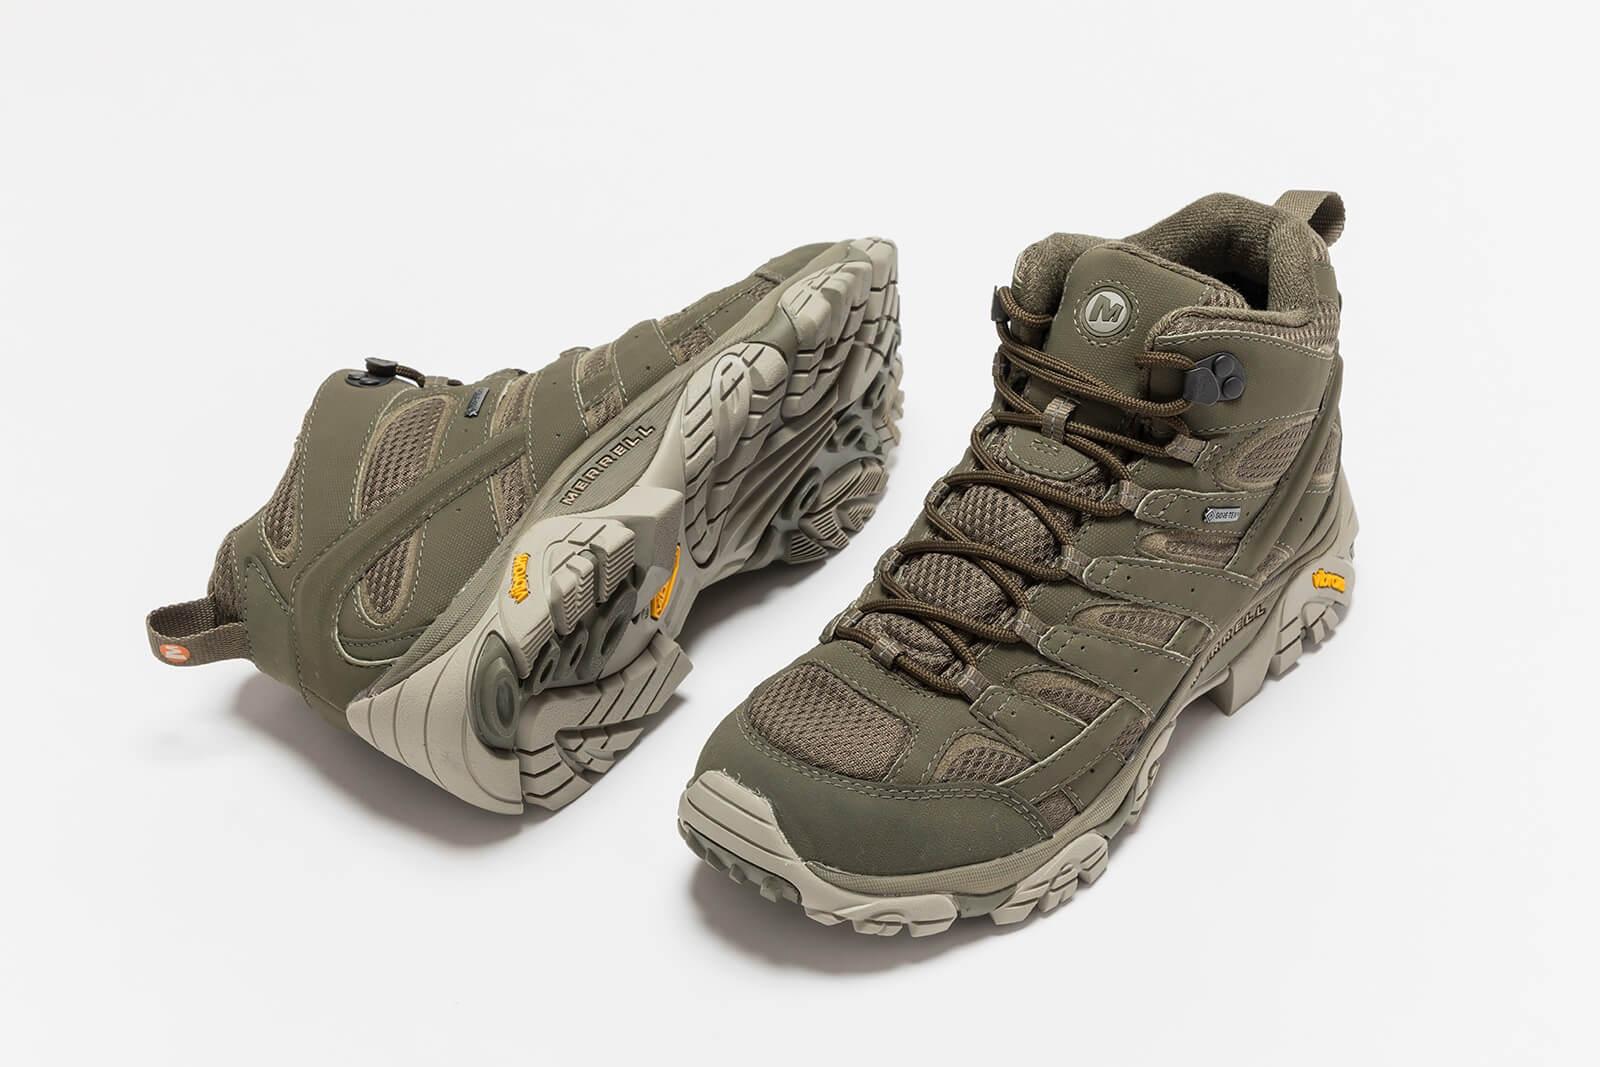 MERRELL(メレル) 新発売の登山靴